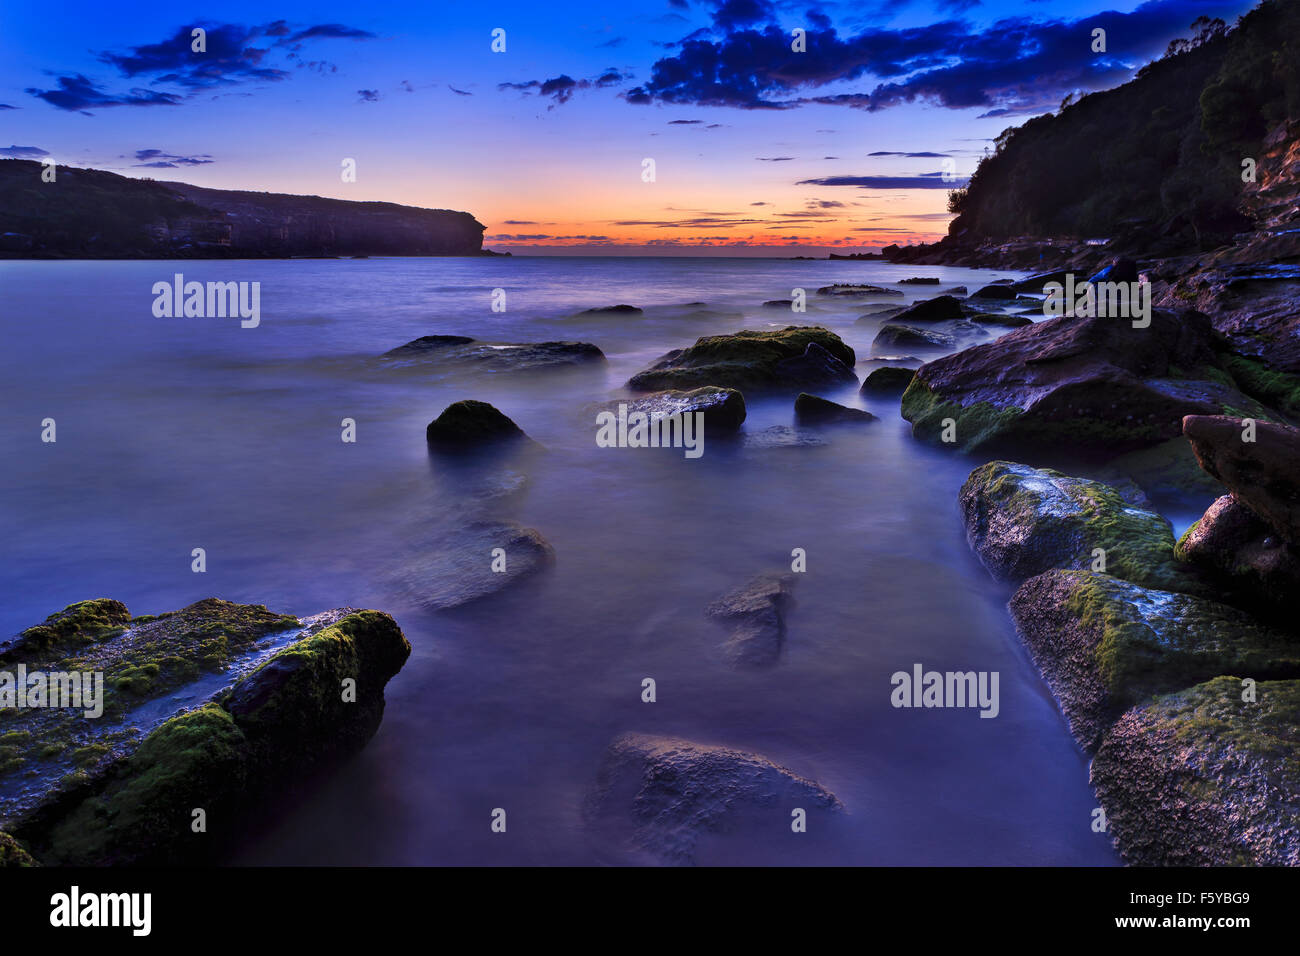 Coastal rocky beach in lagoon of Pacific coast in Australia near Sydney's Royal National Park at sunrise during - Stock Image